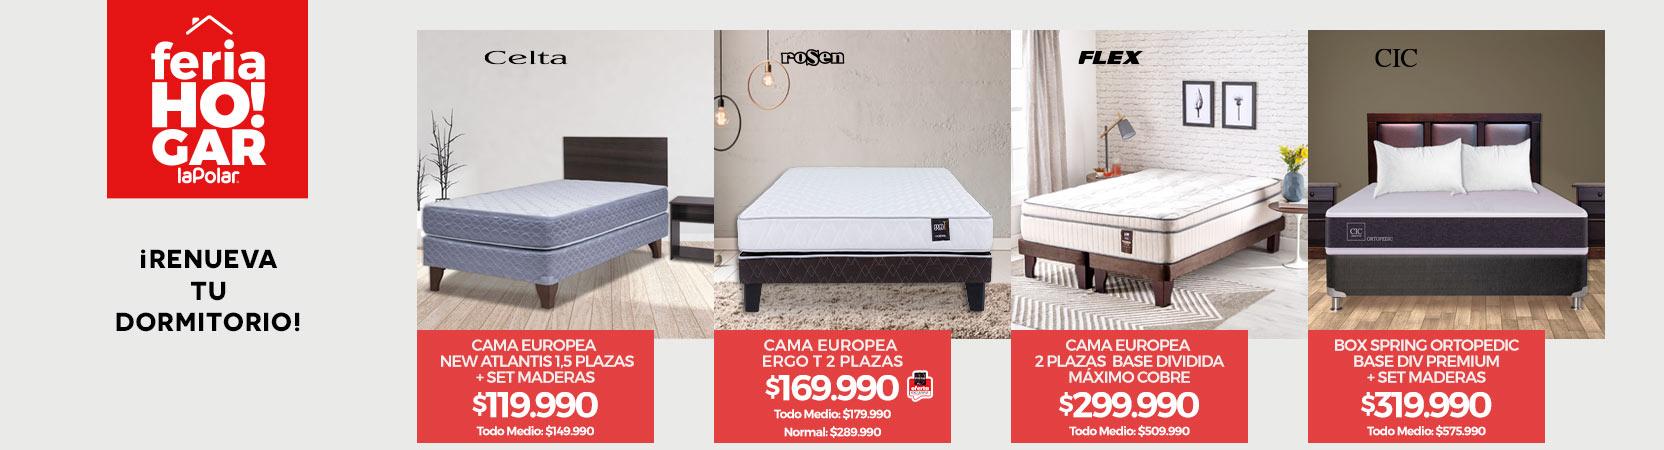 ¡Renueva tu Dormitorio!   Cama Europea New Atlantis 1.5 Plazas + Set Maderas